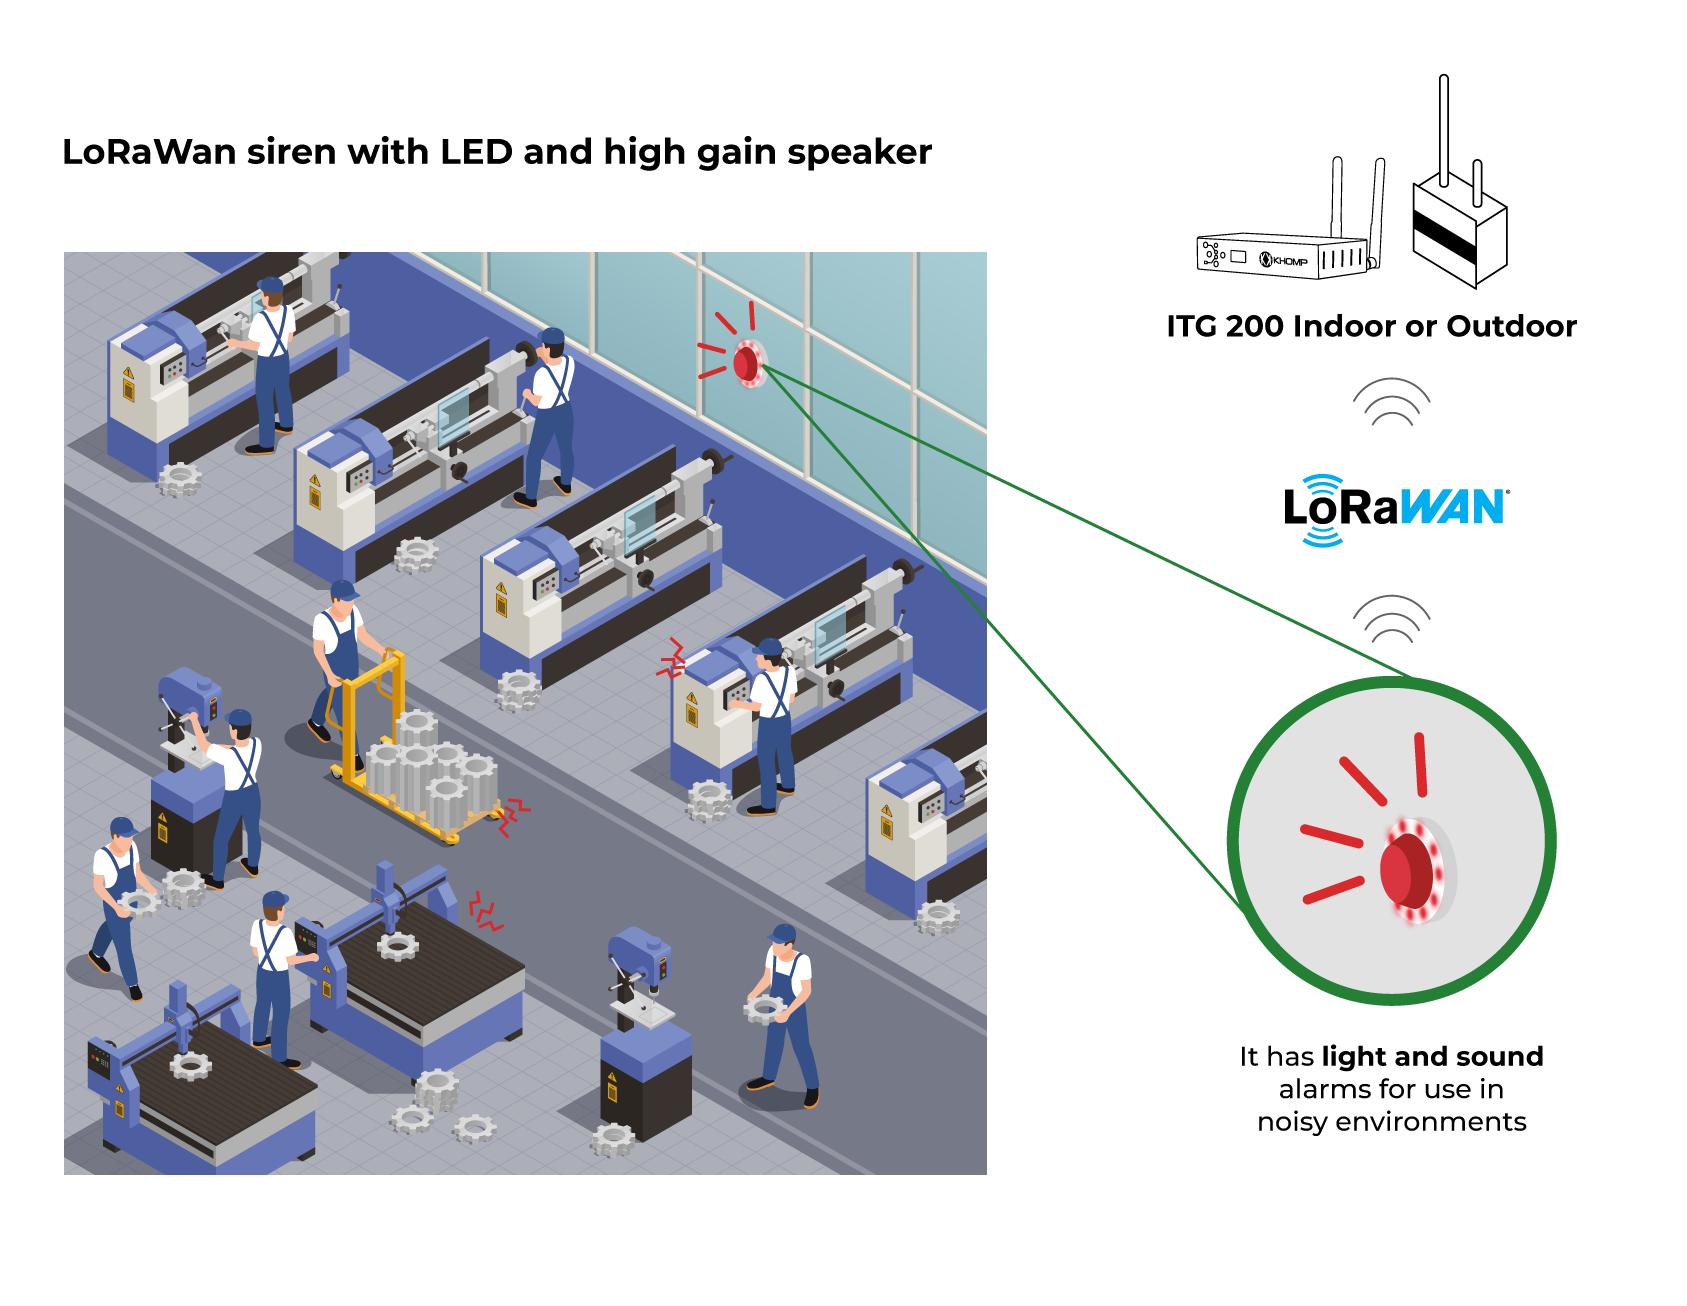 Application Model -Siren with speaker and LEDs